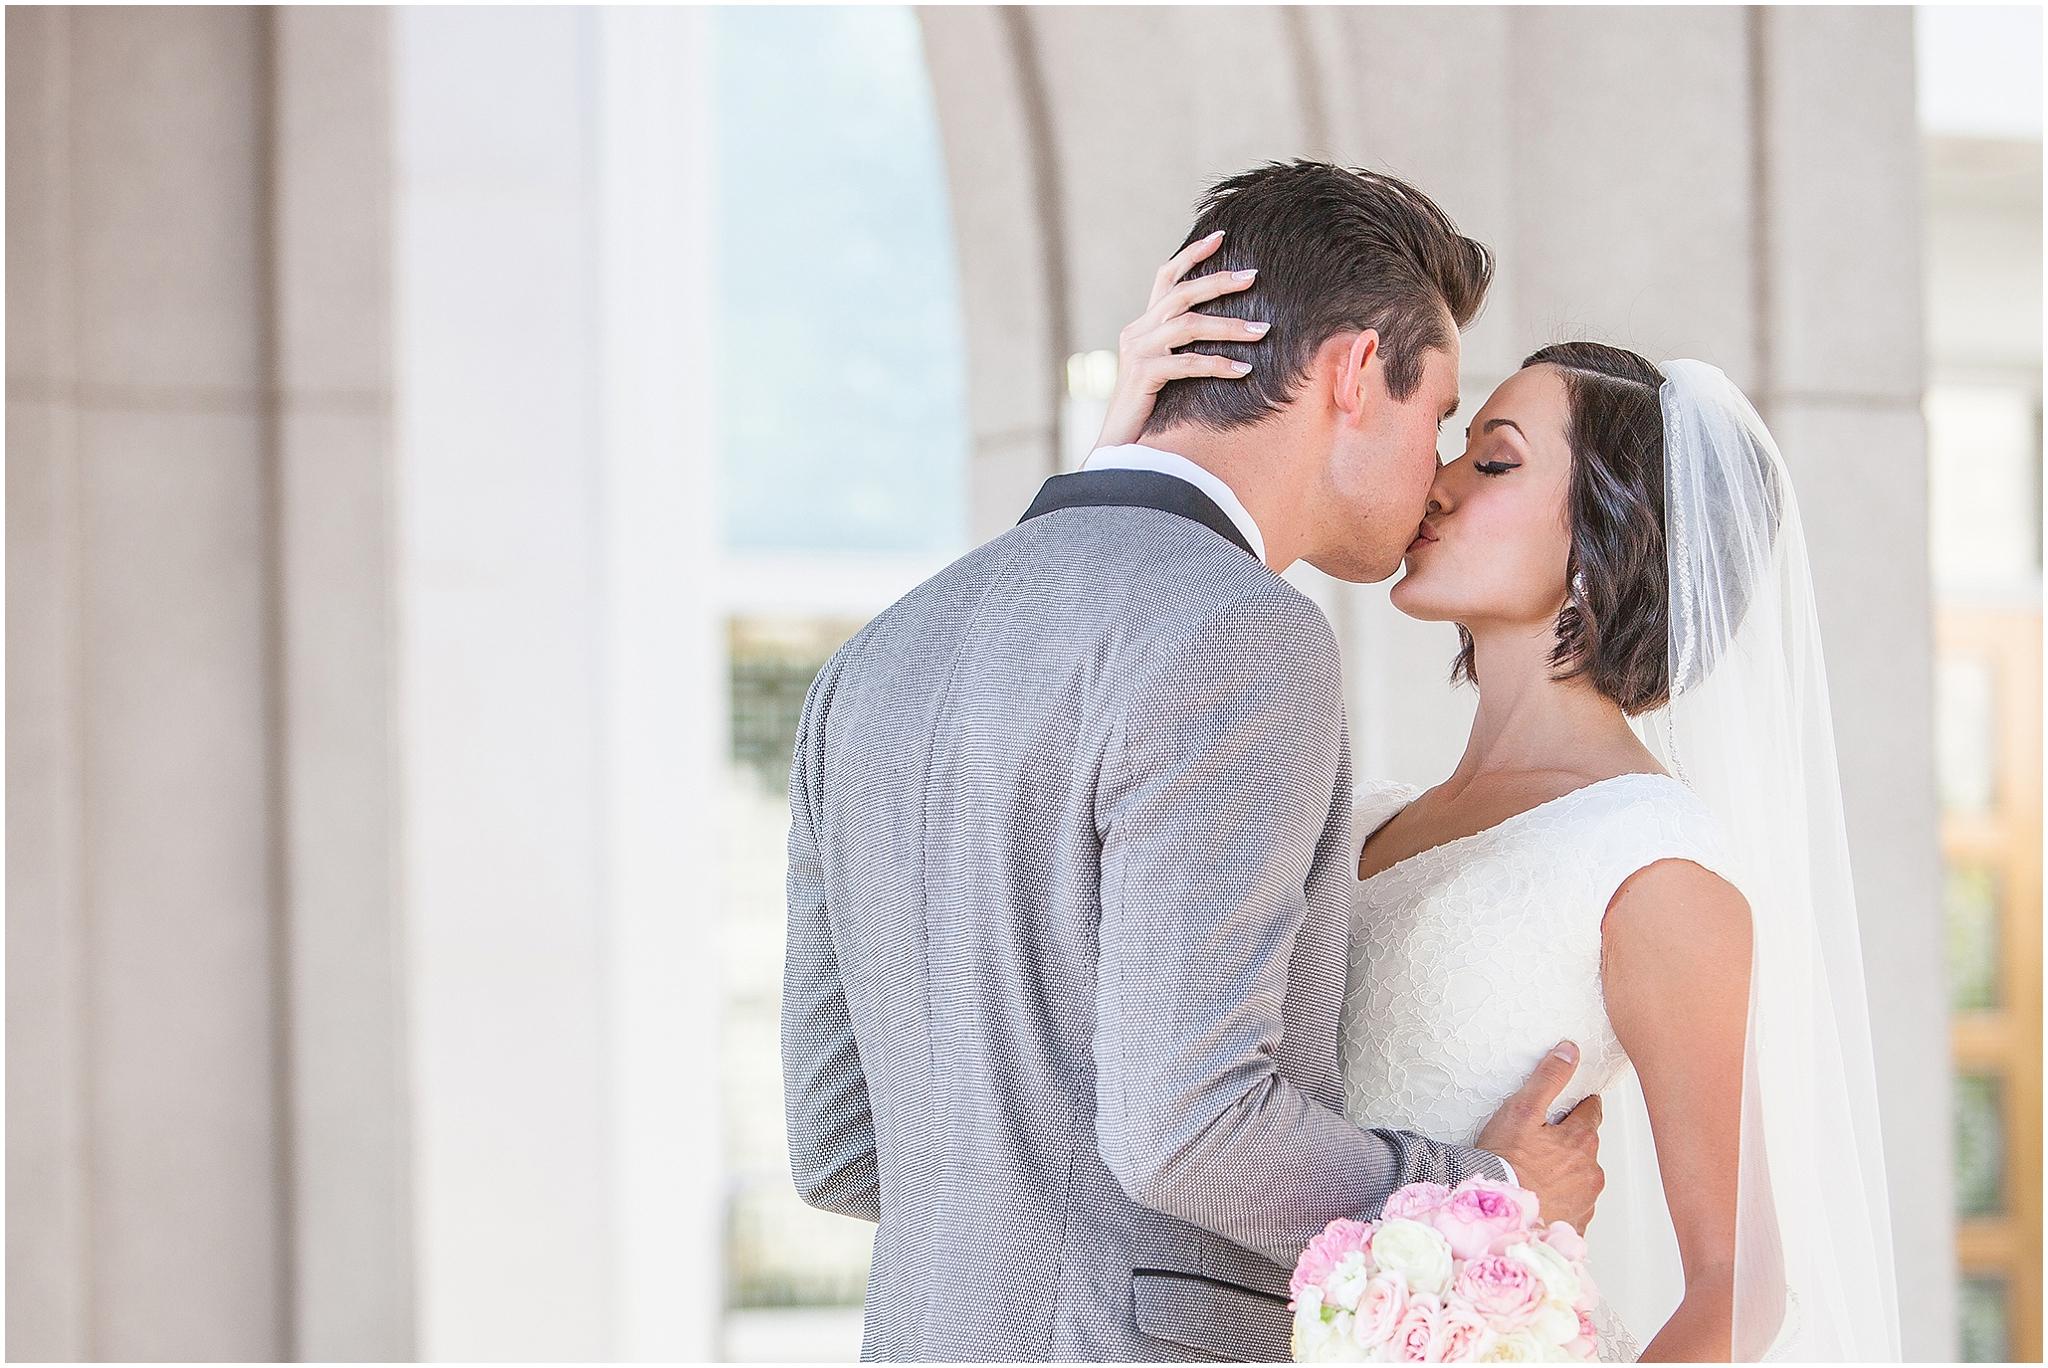 IMG_0018-Edit-101_Lizzie-B-Imagery-Utah-Wedding-Photographer-Salt-Lake-City-Park-City-timpanogos-Utah-Temple.jpg